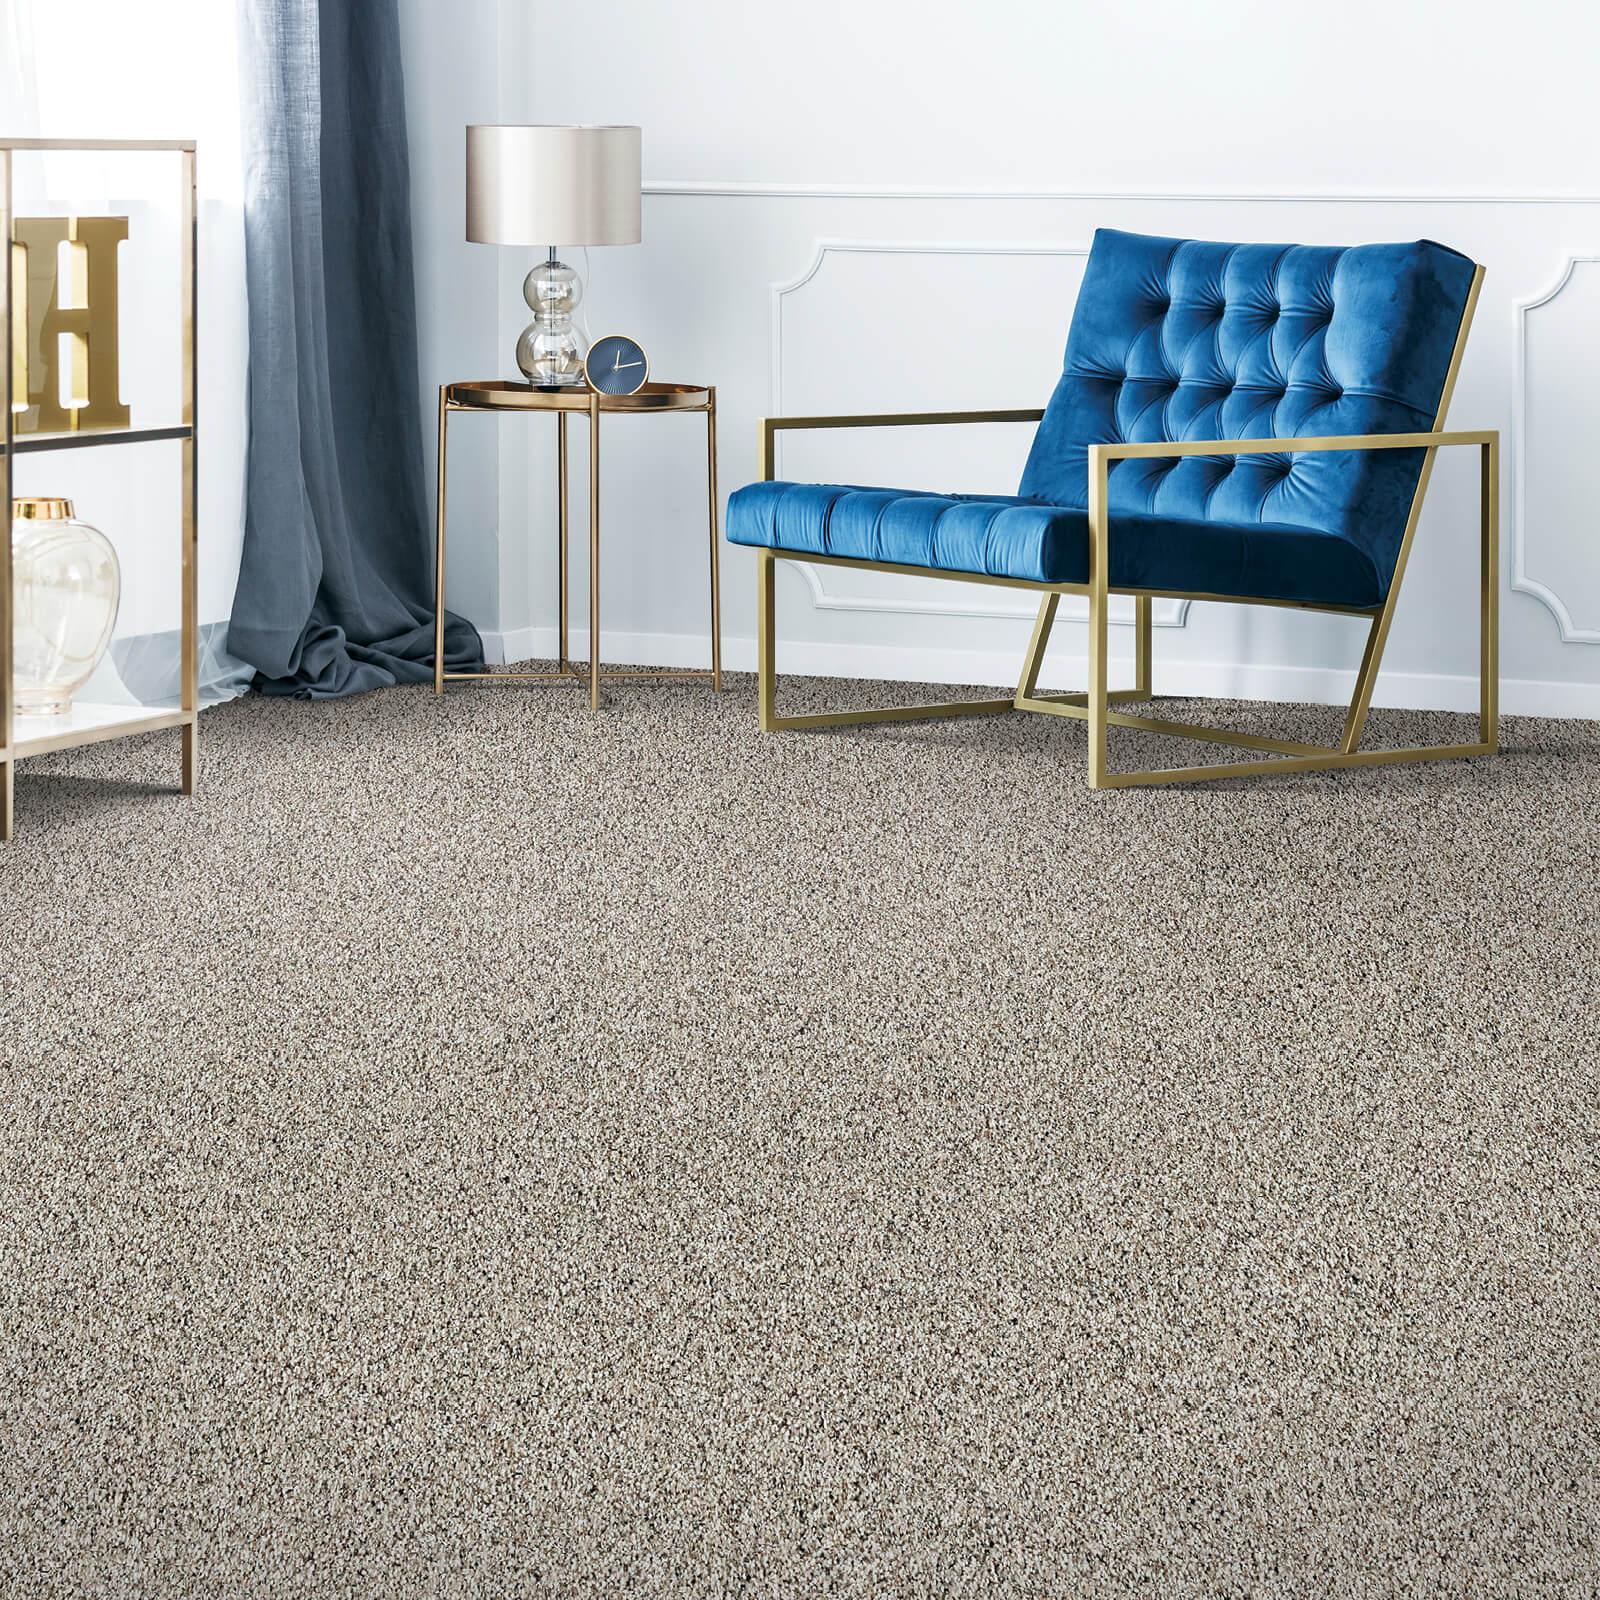 Remarkable carpet Vision | Dolphin Carpet & Tile